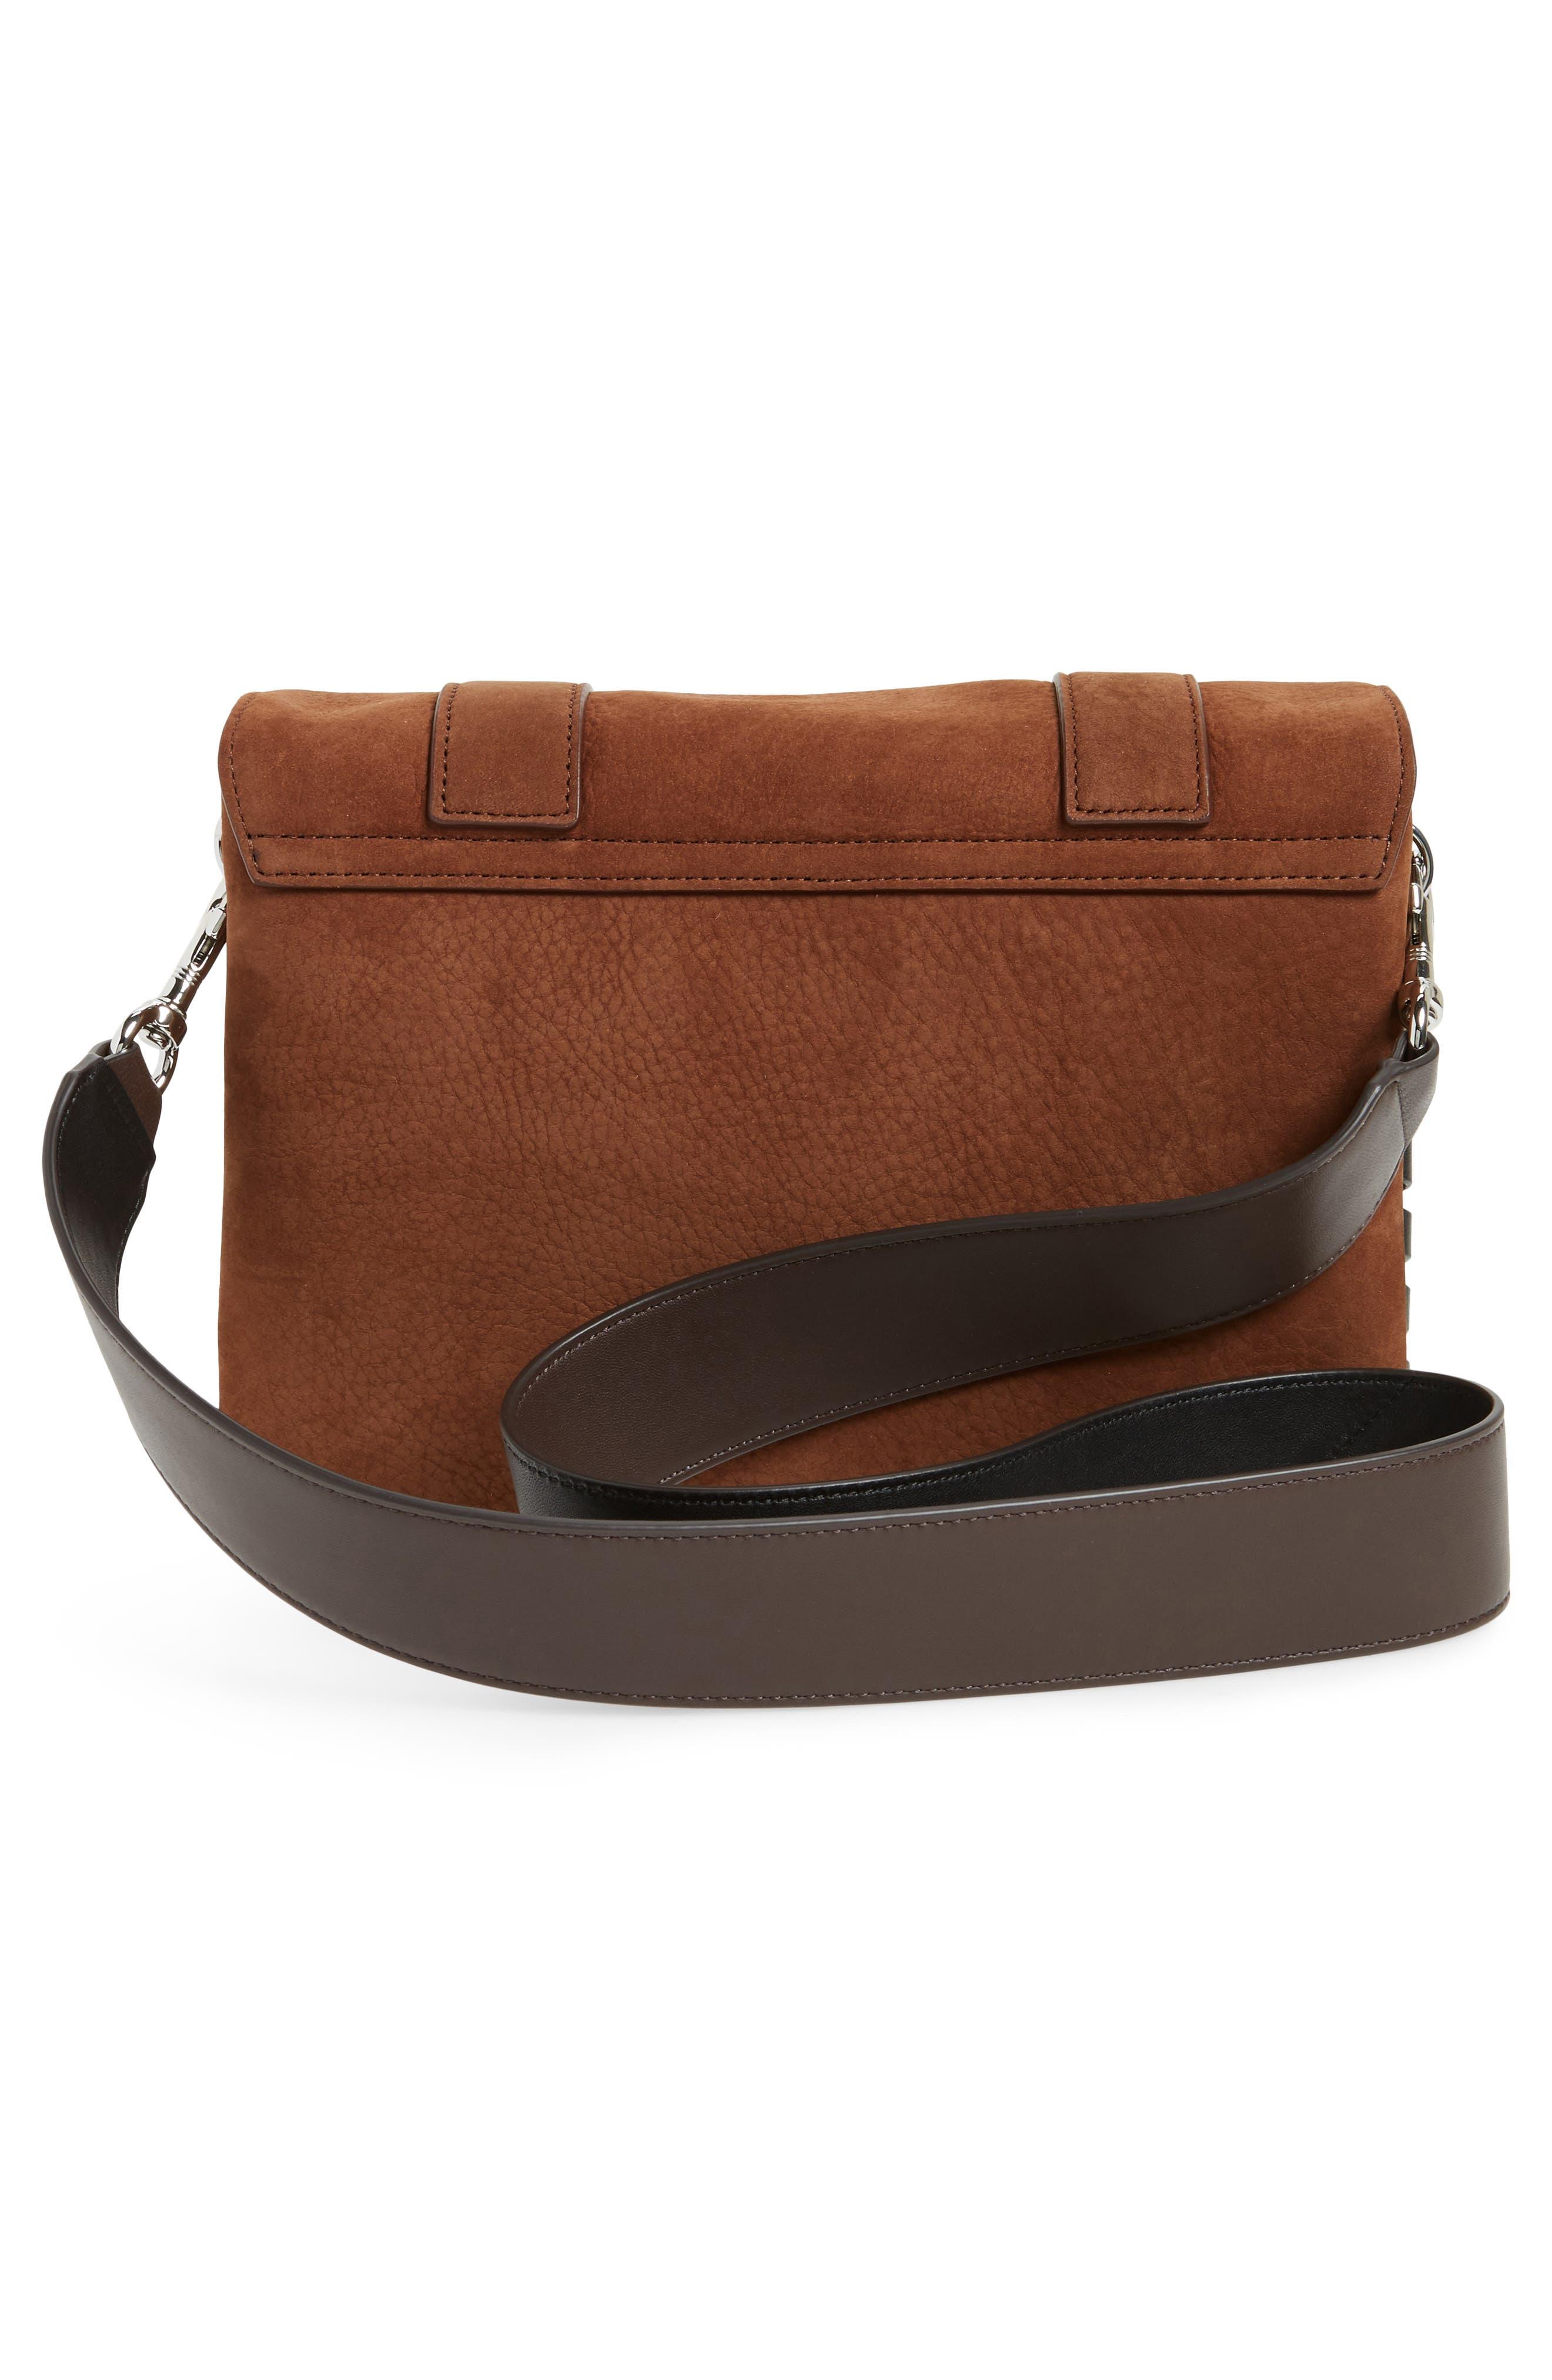 Fin Leather Box Bag,                             Alternate thumbnail 3, color,                             200